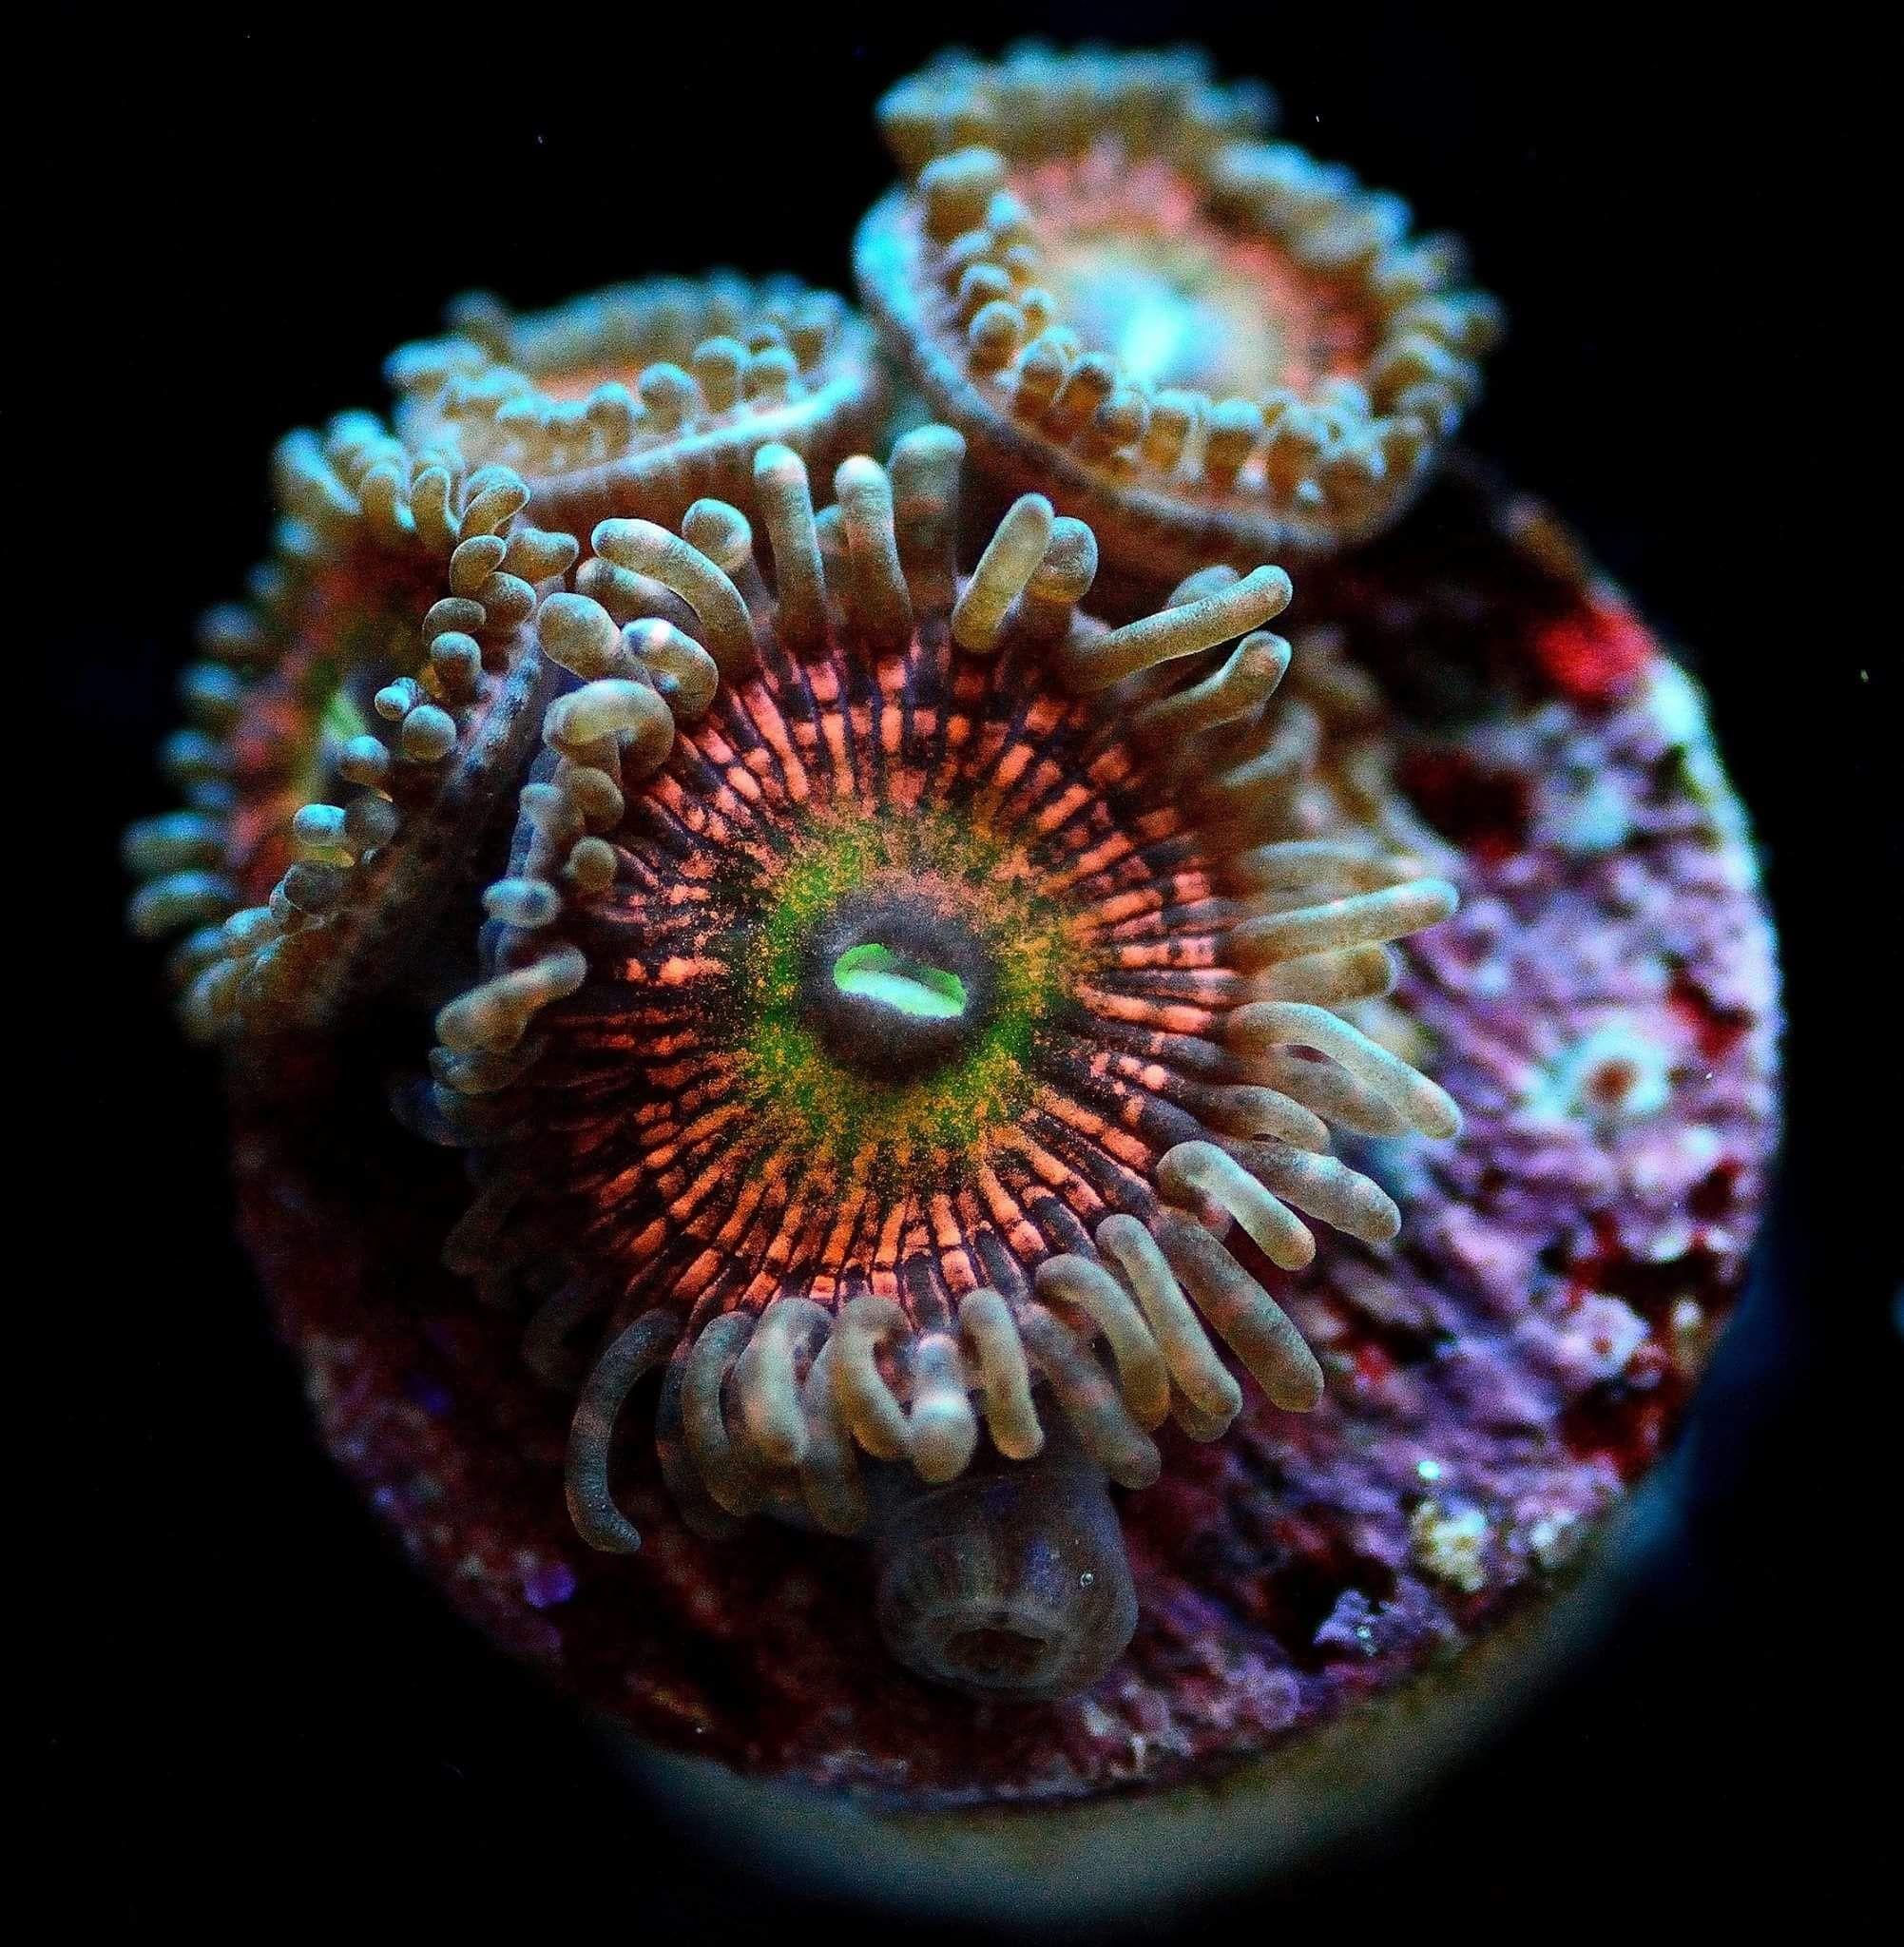 Pin By Reefcreators On Marine Animal